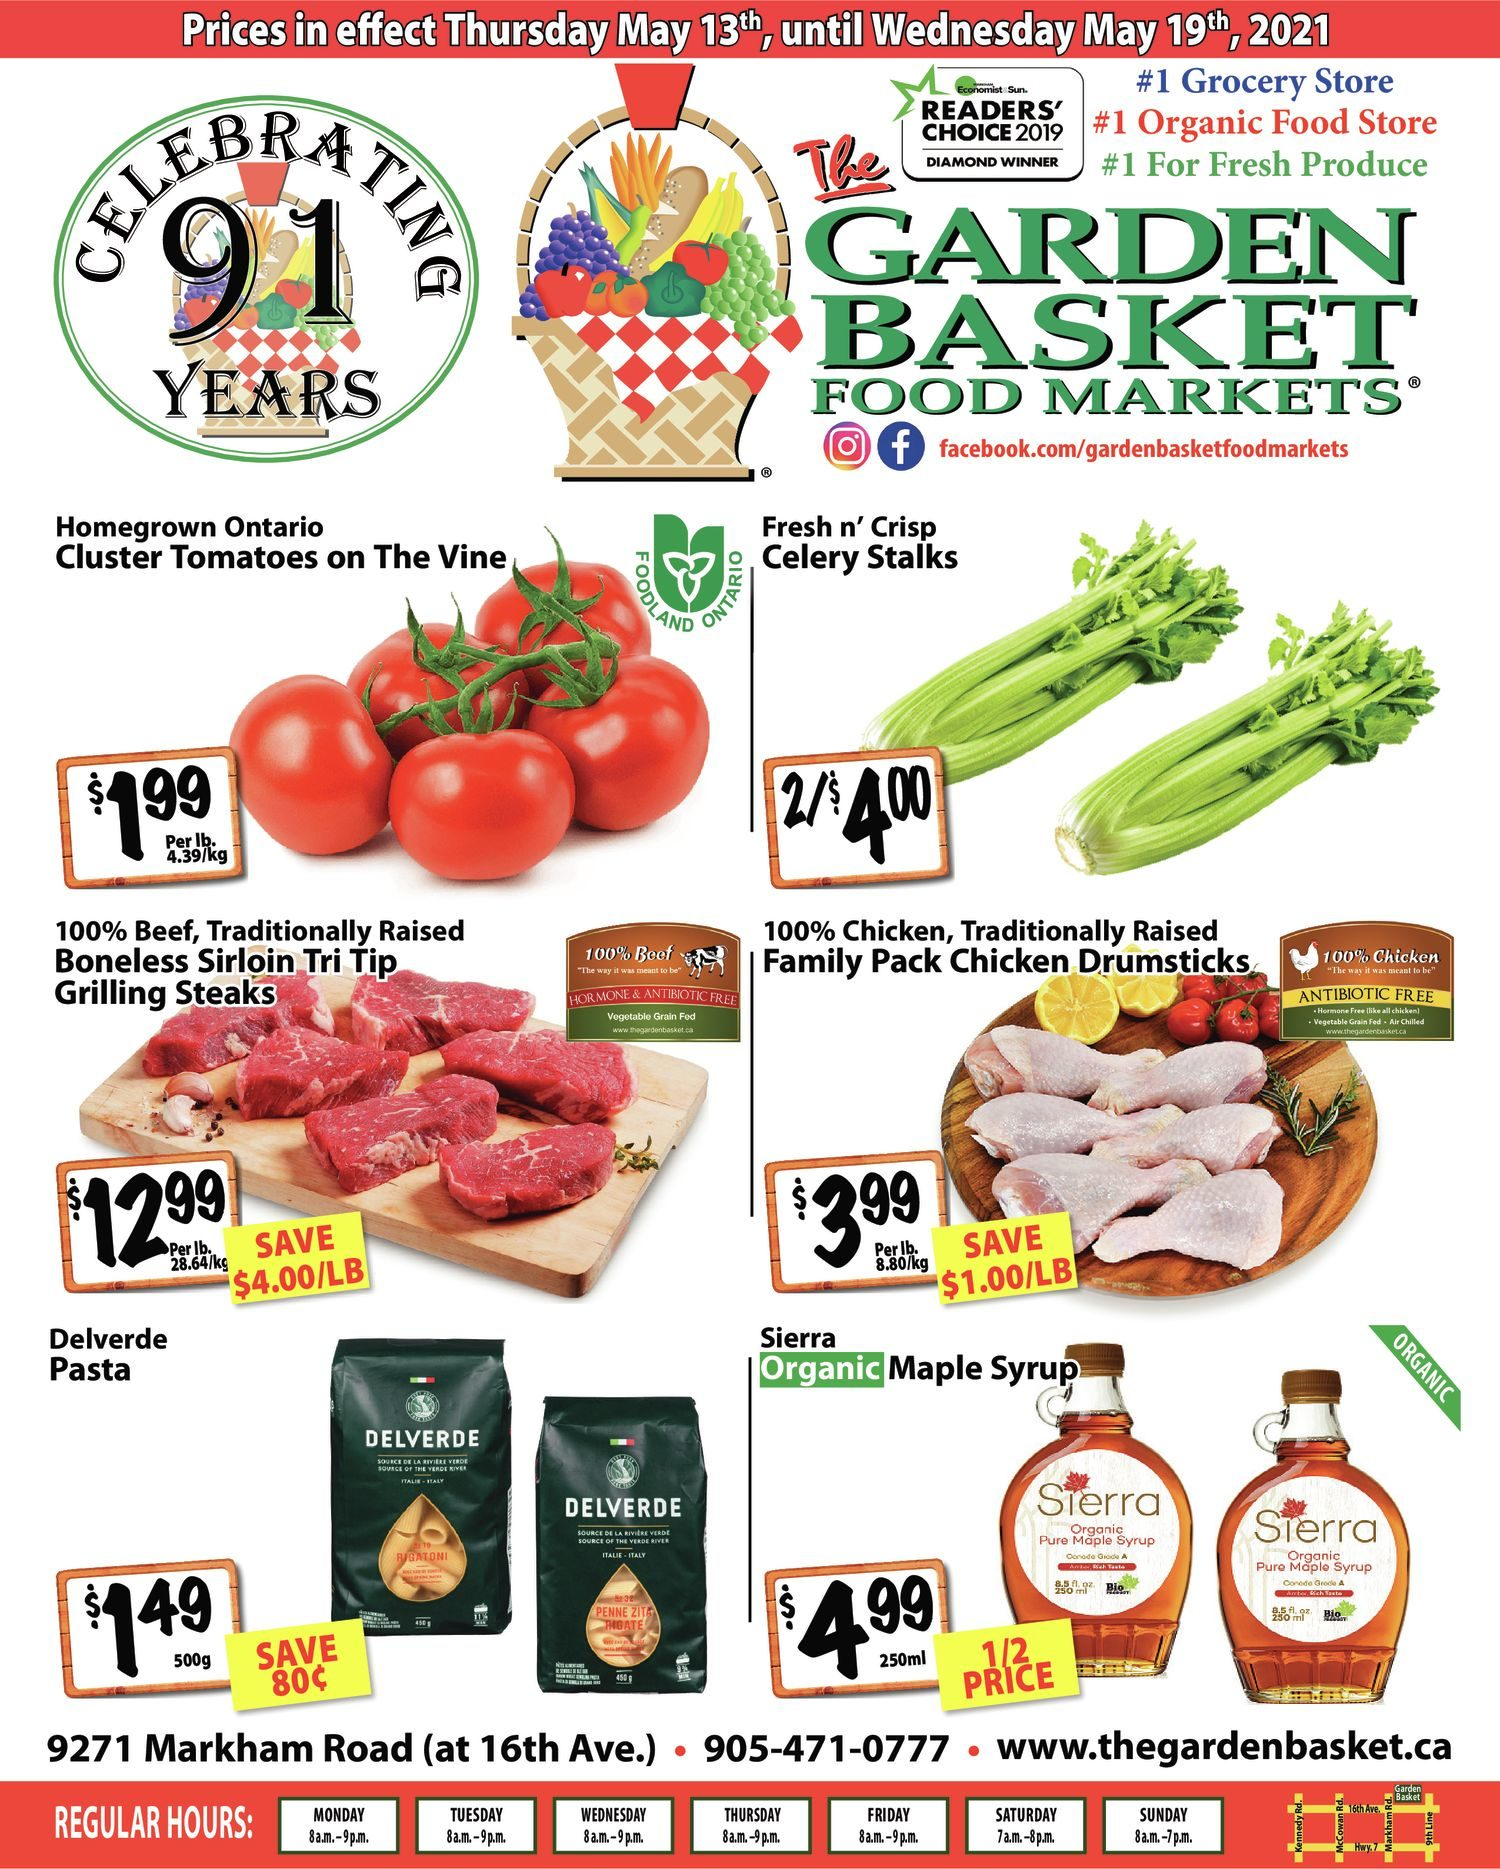 The Garden Basket - Weekly Flyer Specials